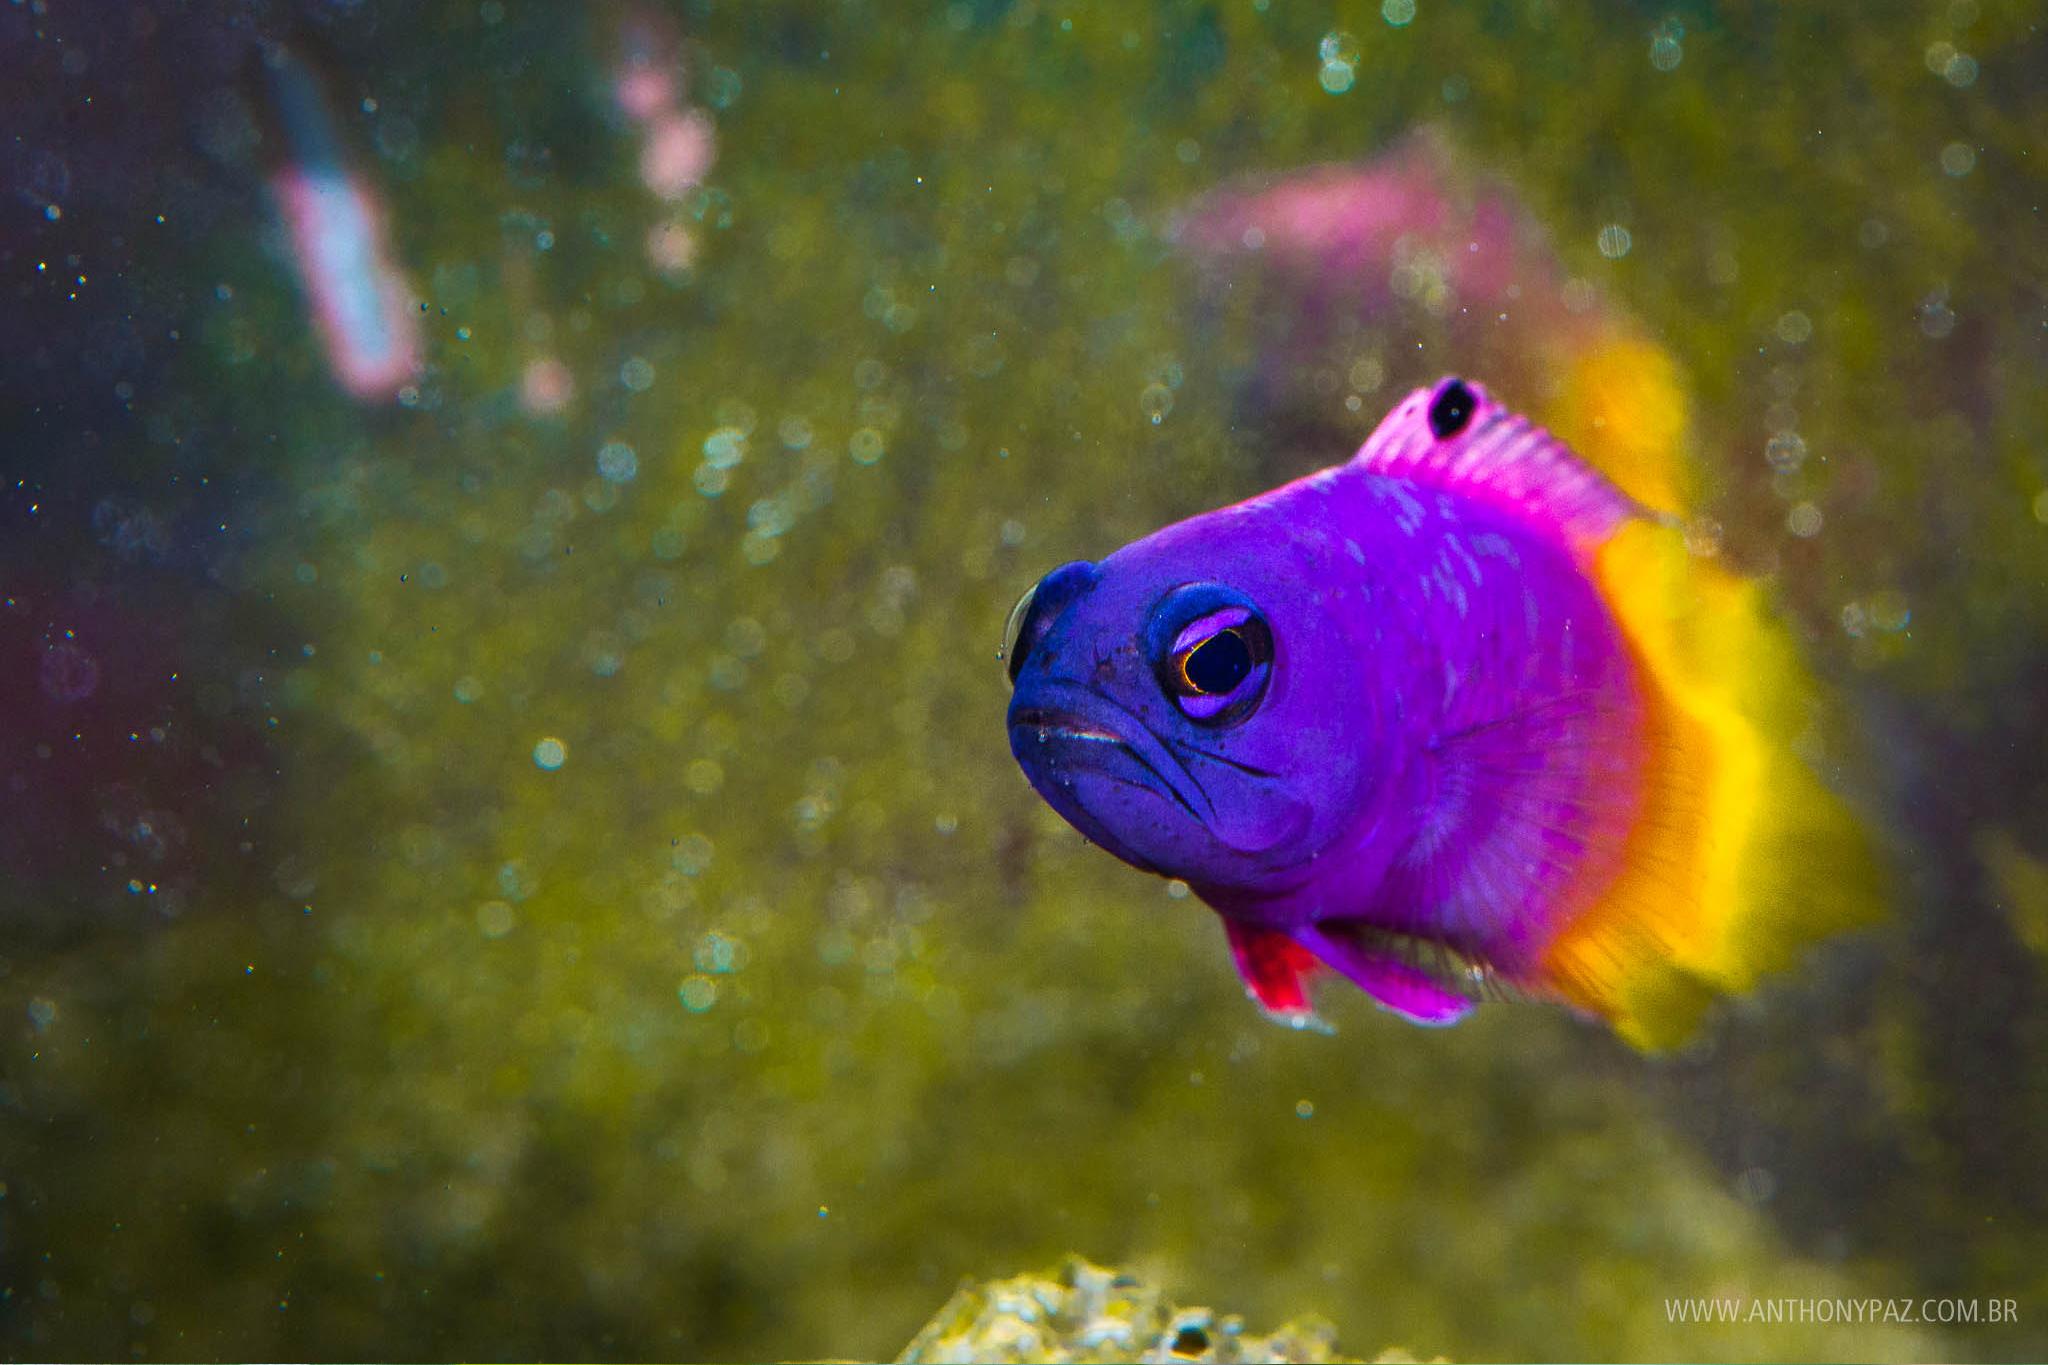 fotografia-natureza-macro-peixe-fotografo-anthony-paz-04.jpg